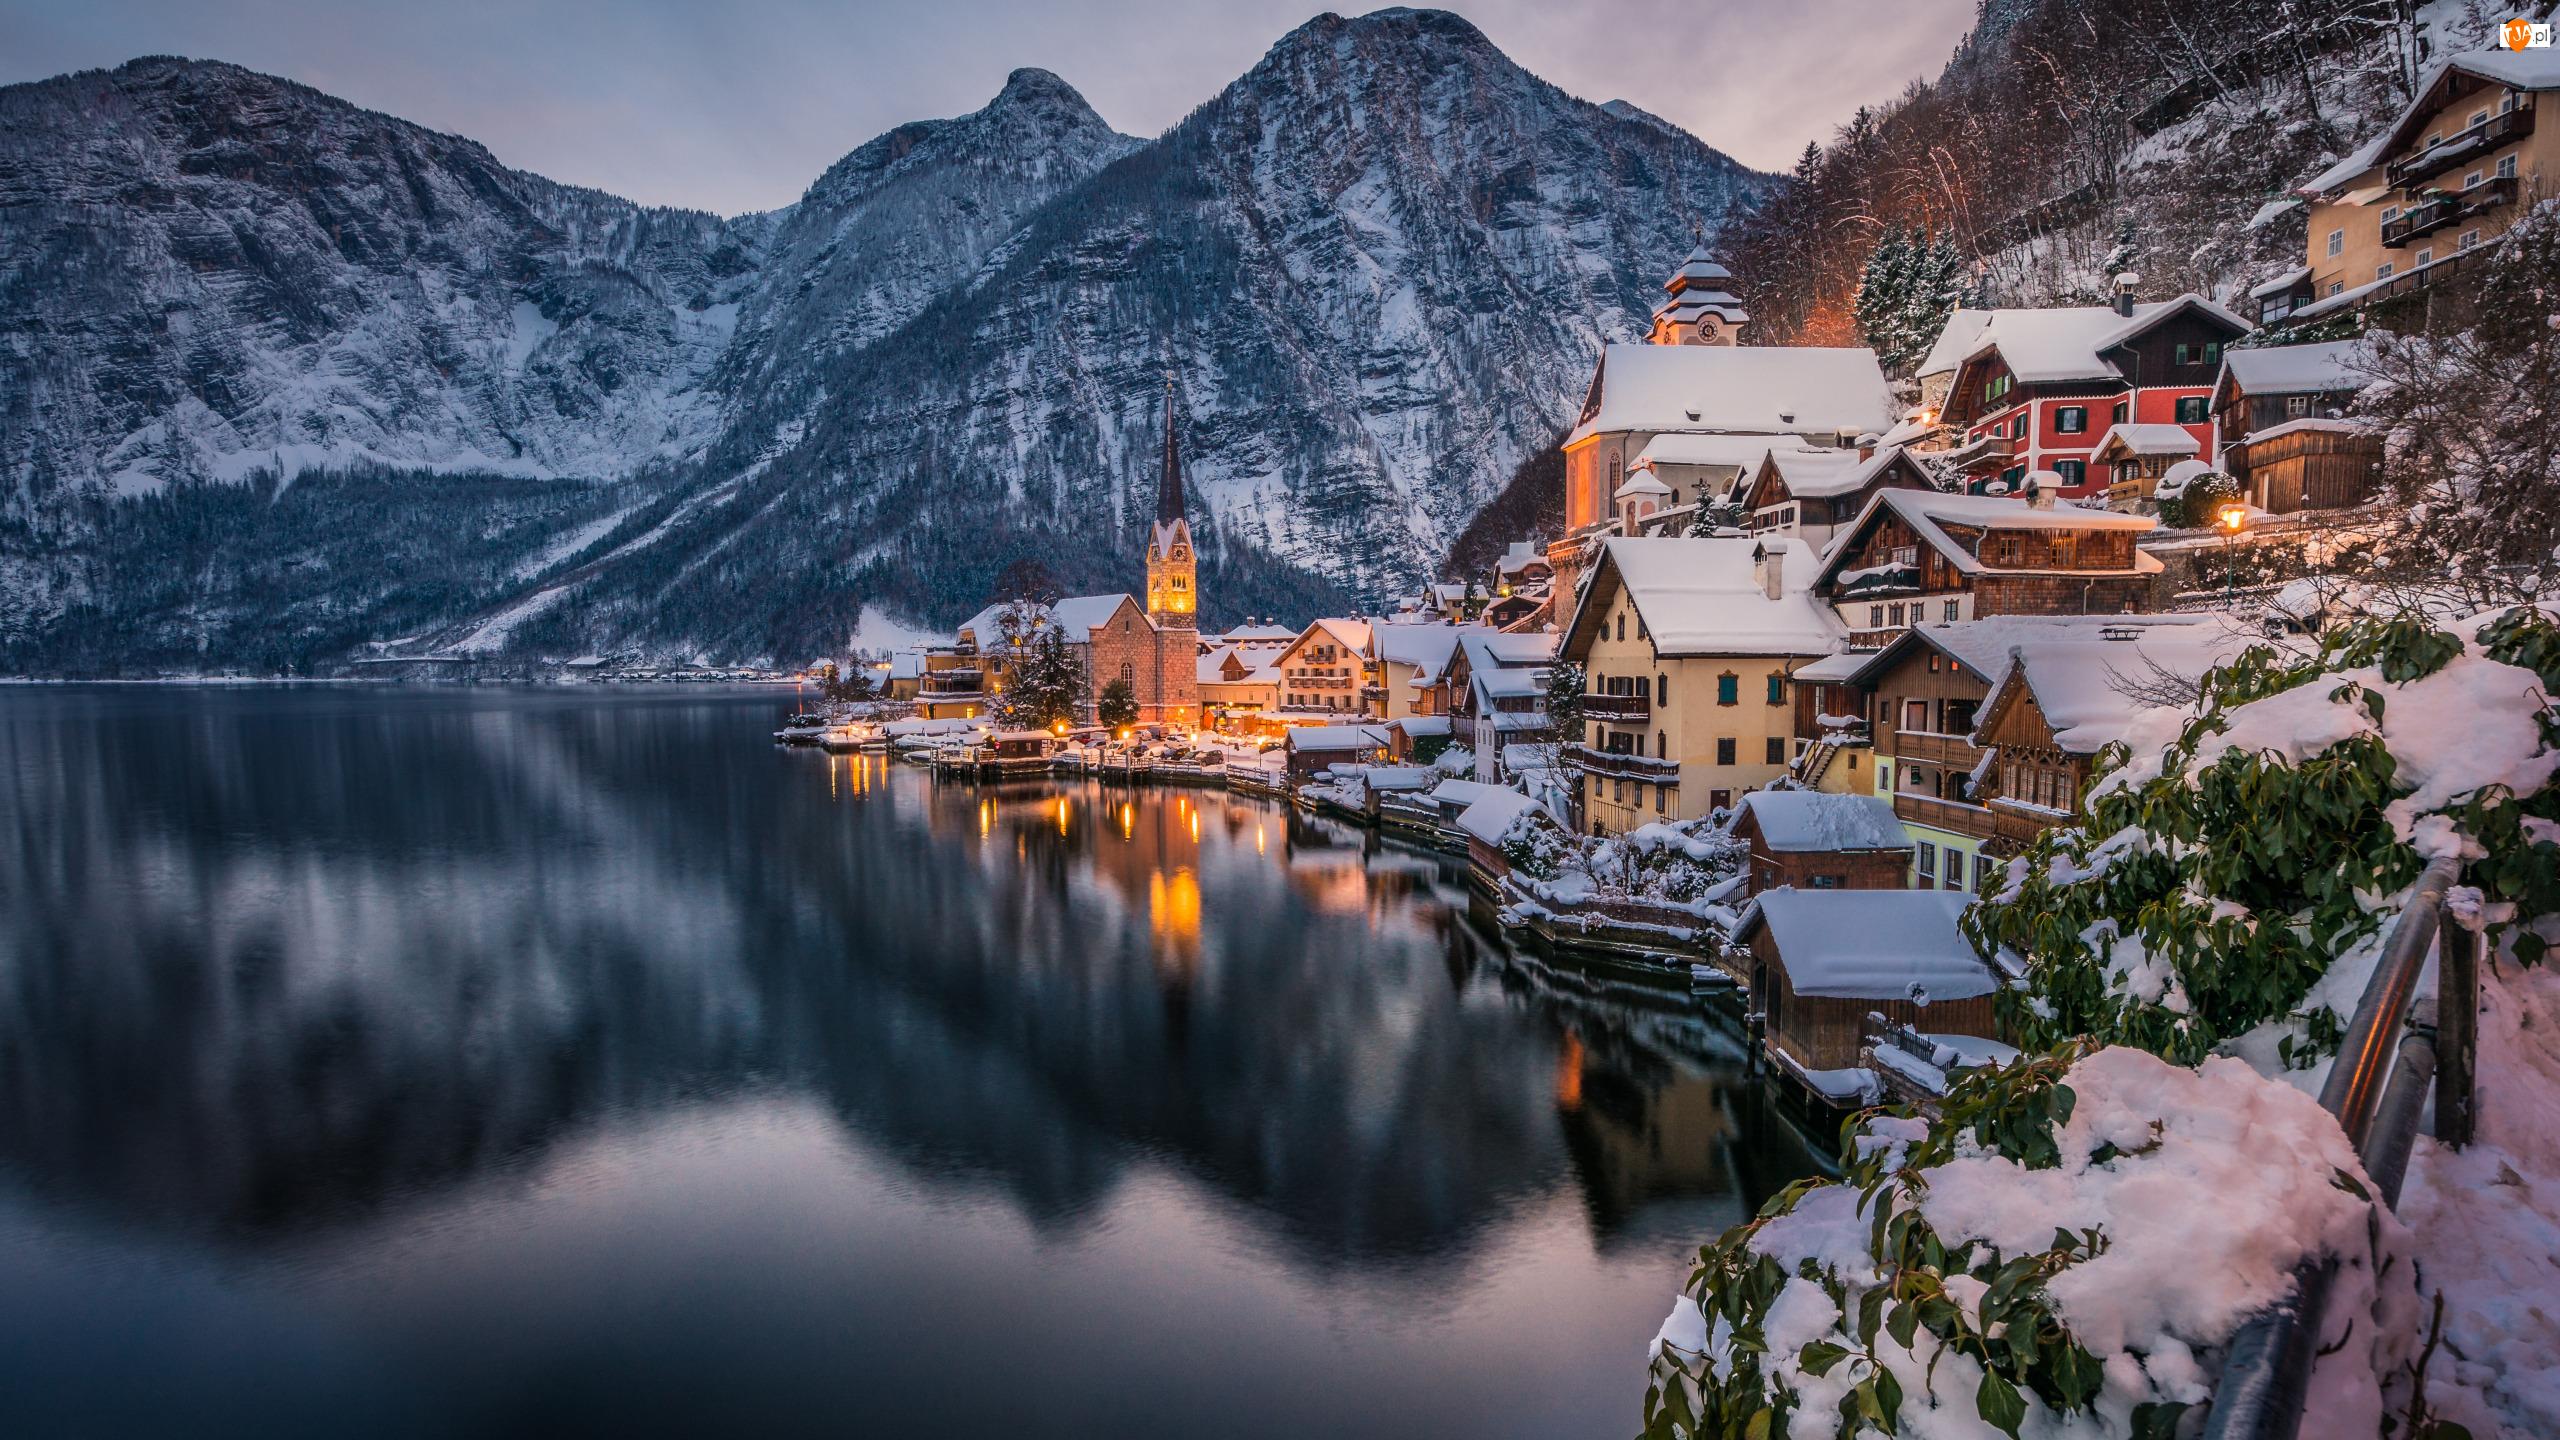 Hallstatt, Austria, Alpy, Zima, Góry, Jezioro Hallstattersee